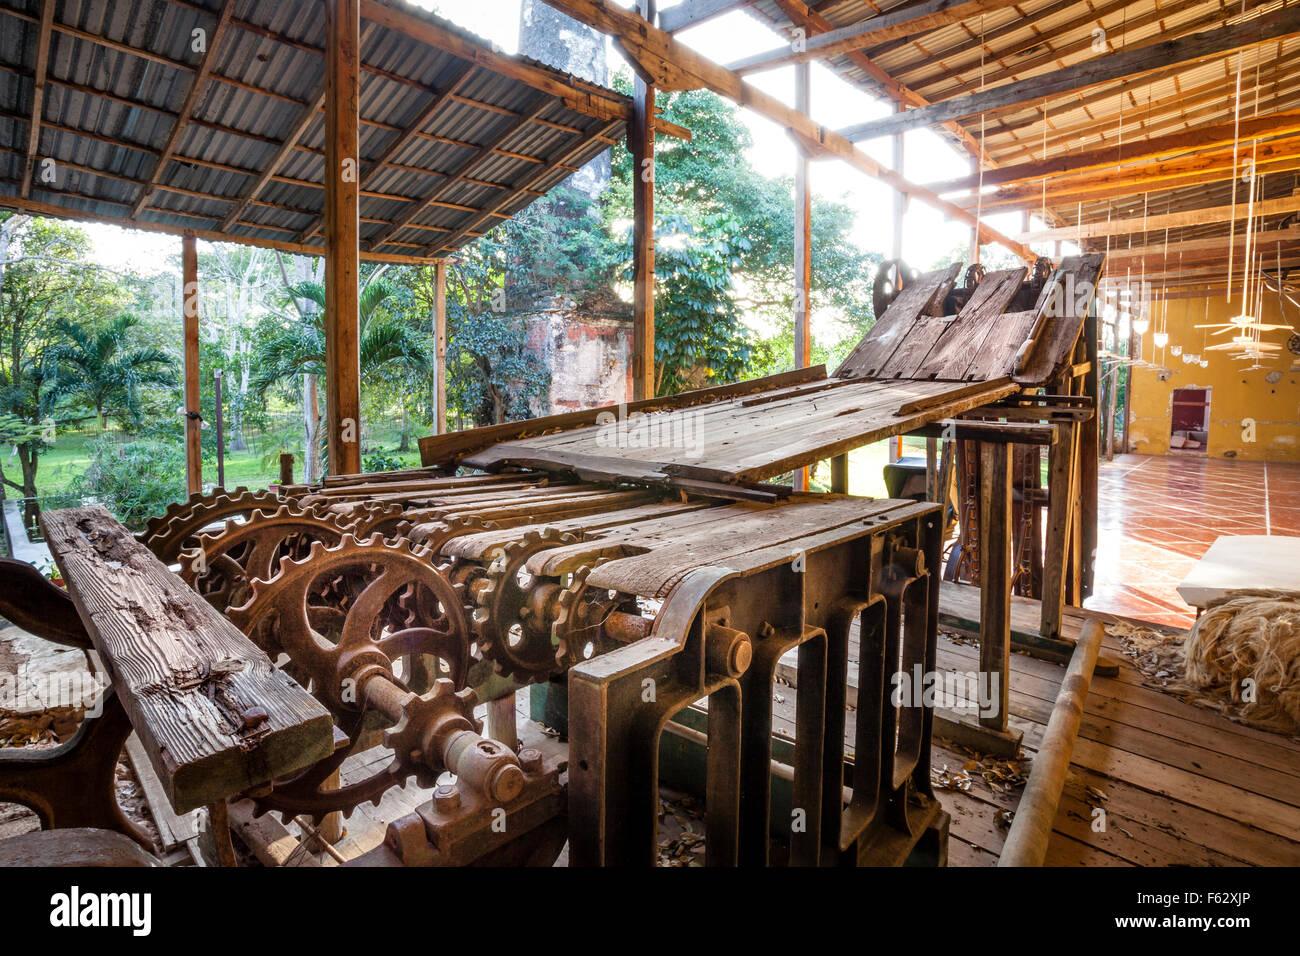 Old henequen crusher at the Temozon Hacienda in Yucatan, Mexico. - Stock Image